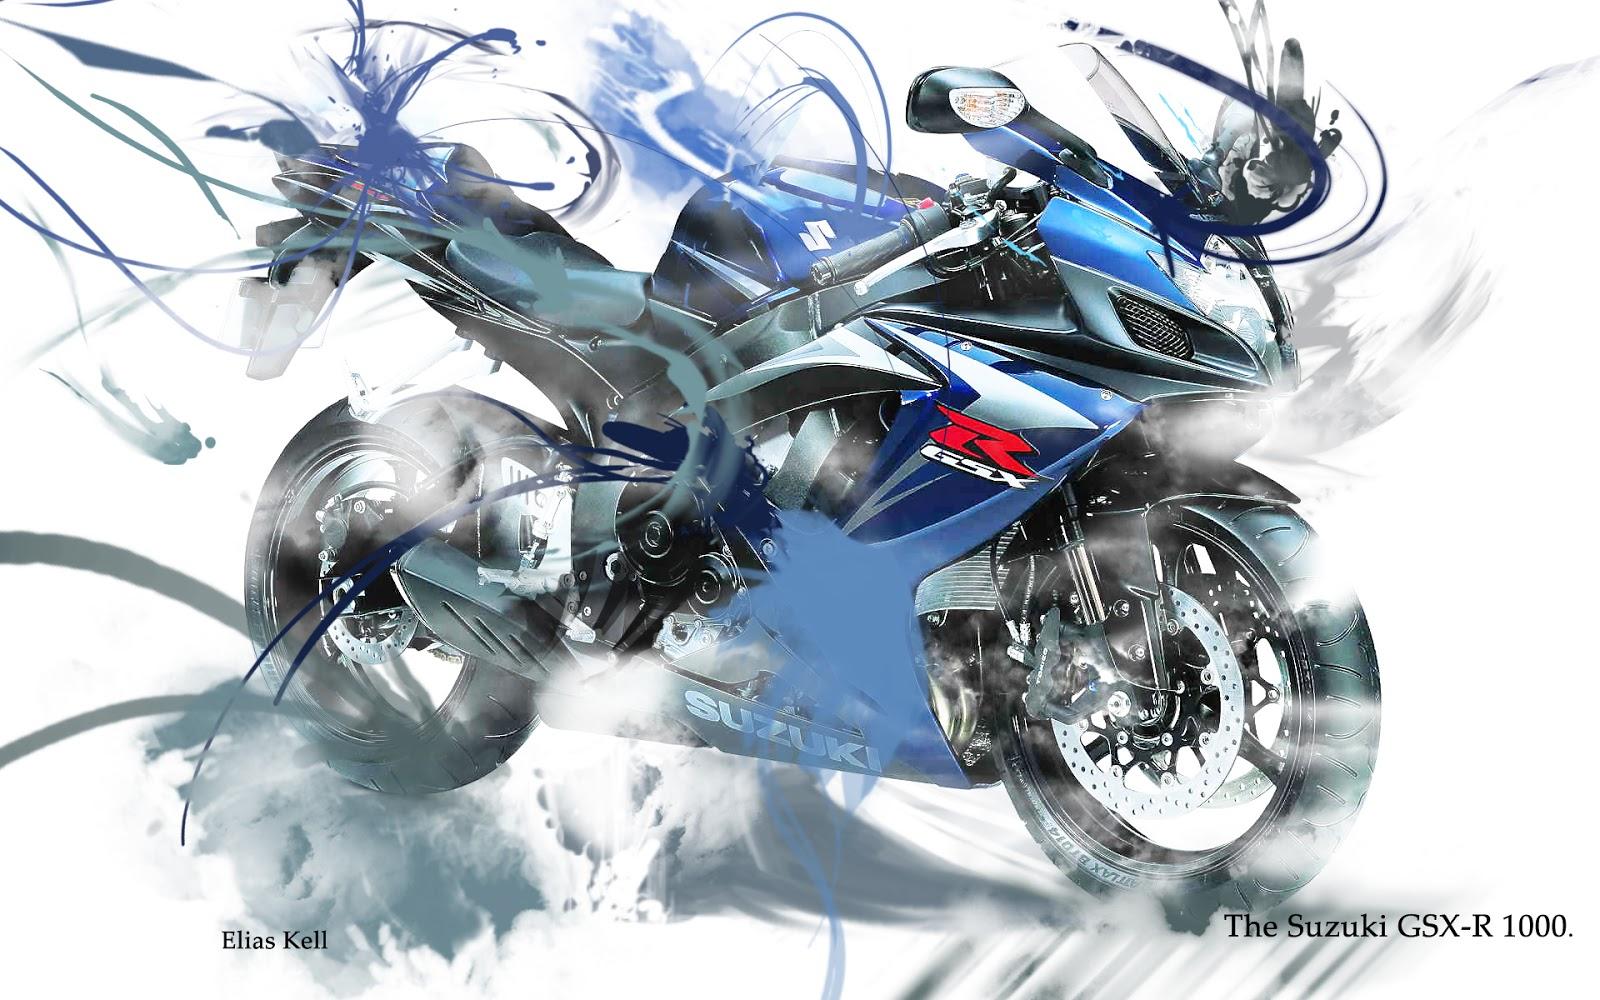 Luusama Motorcycle And Helmet Blog News Suzuki GSX R1000 Animation 1600x1000